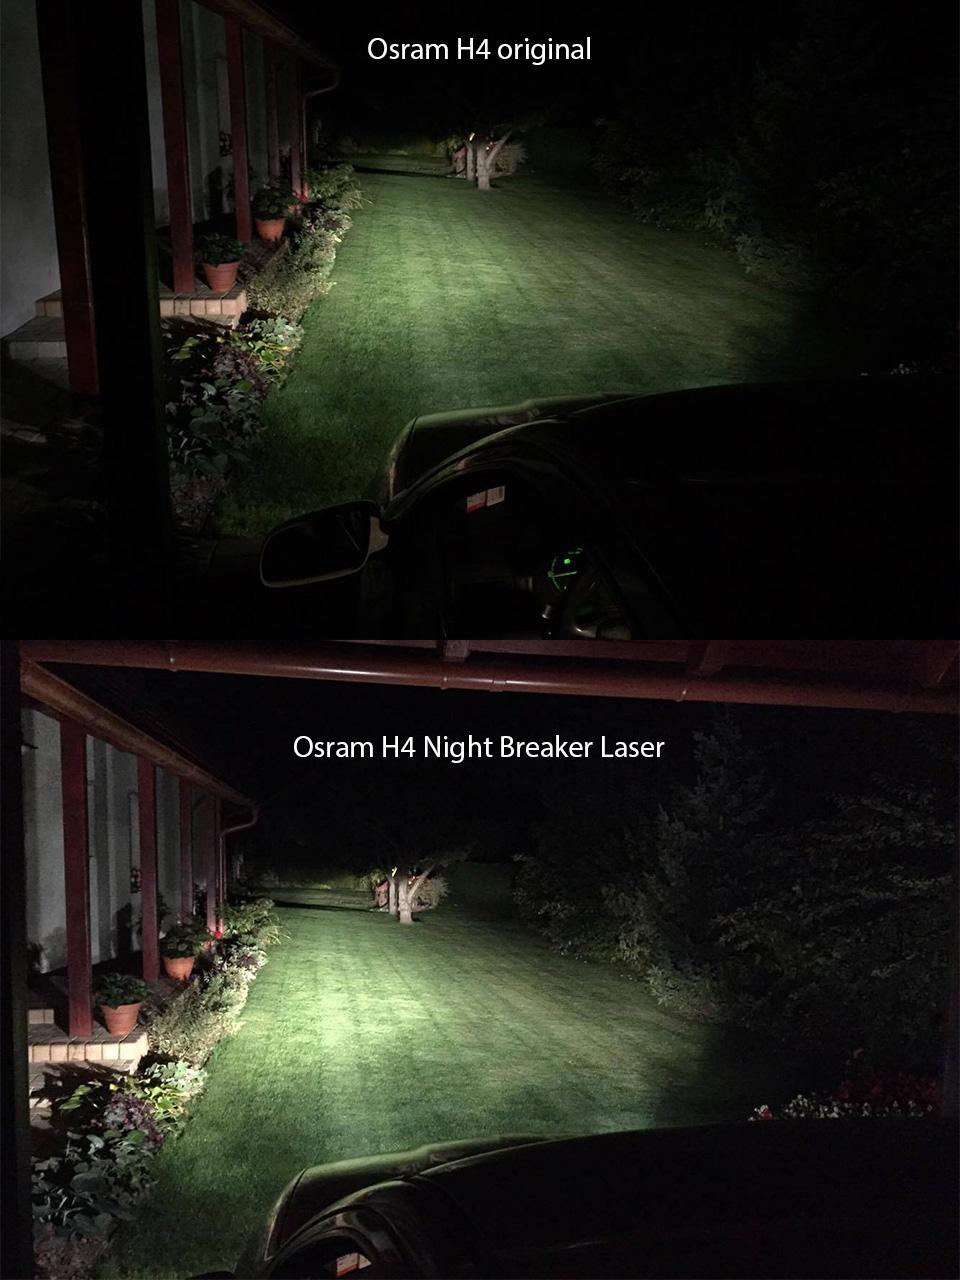 osram h4 12v 60 55w night breaker laser box auto iarovky osram. Black Bedroom Furniture Sets. Home Design Ideas